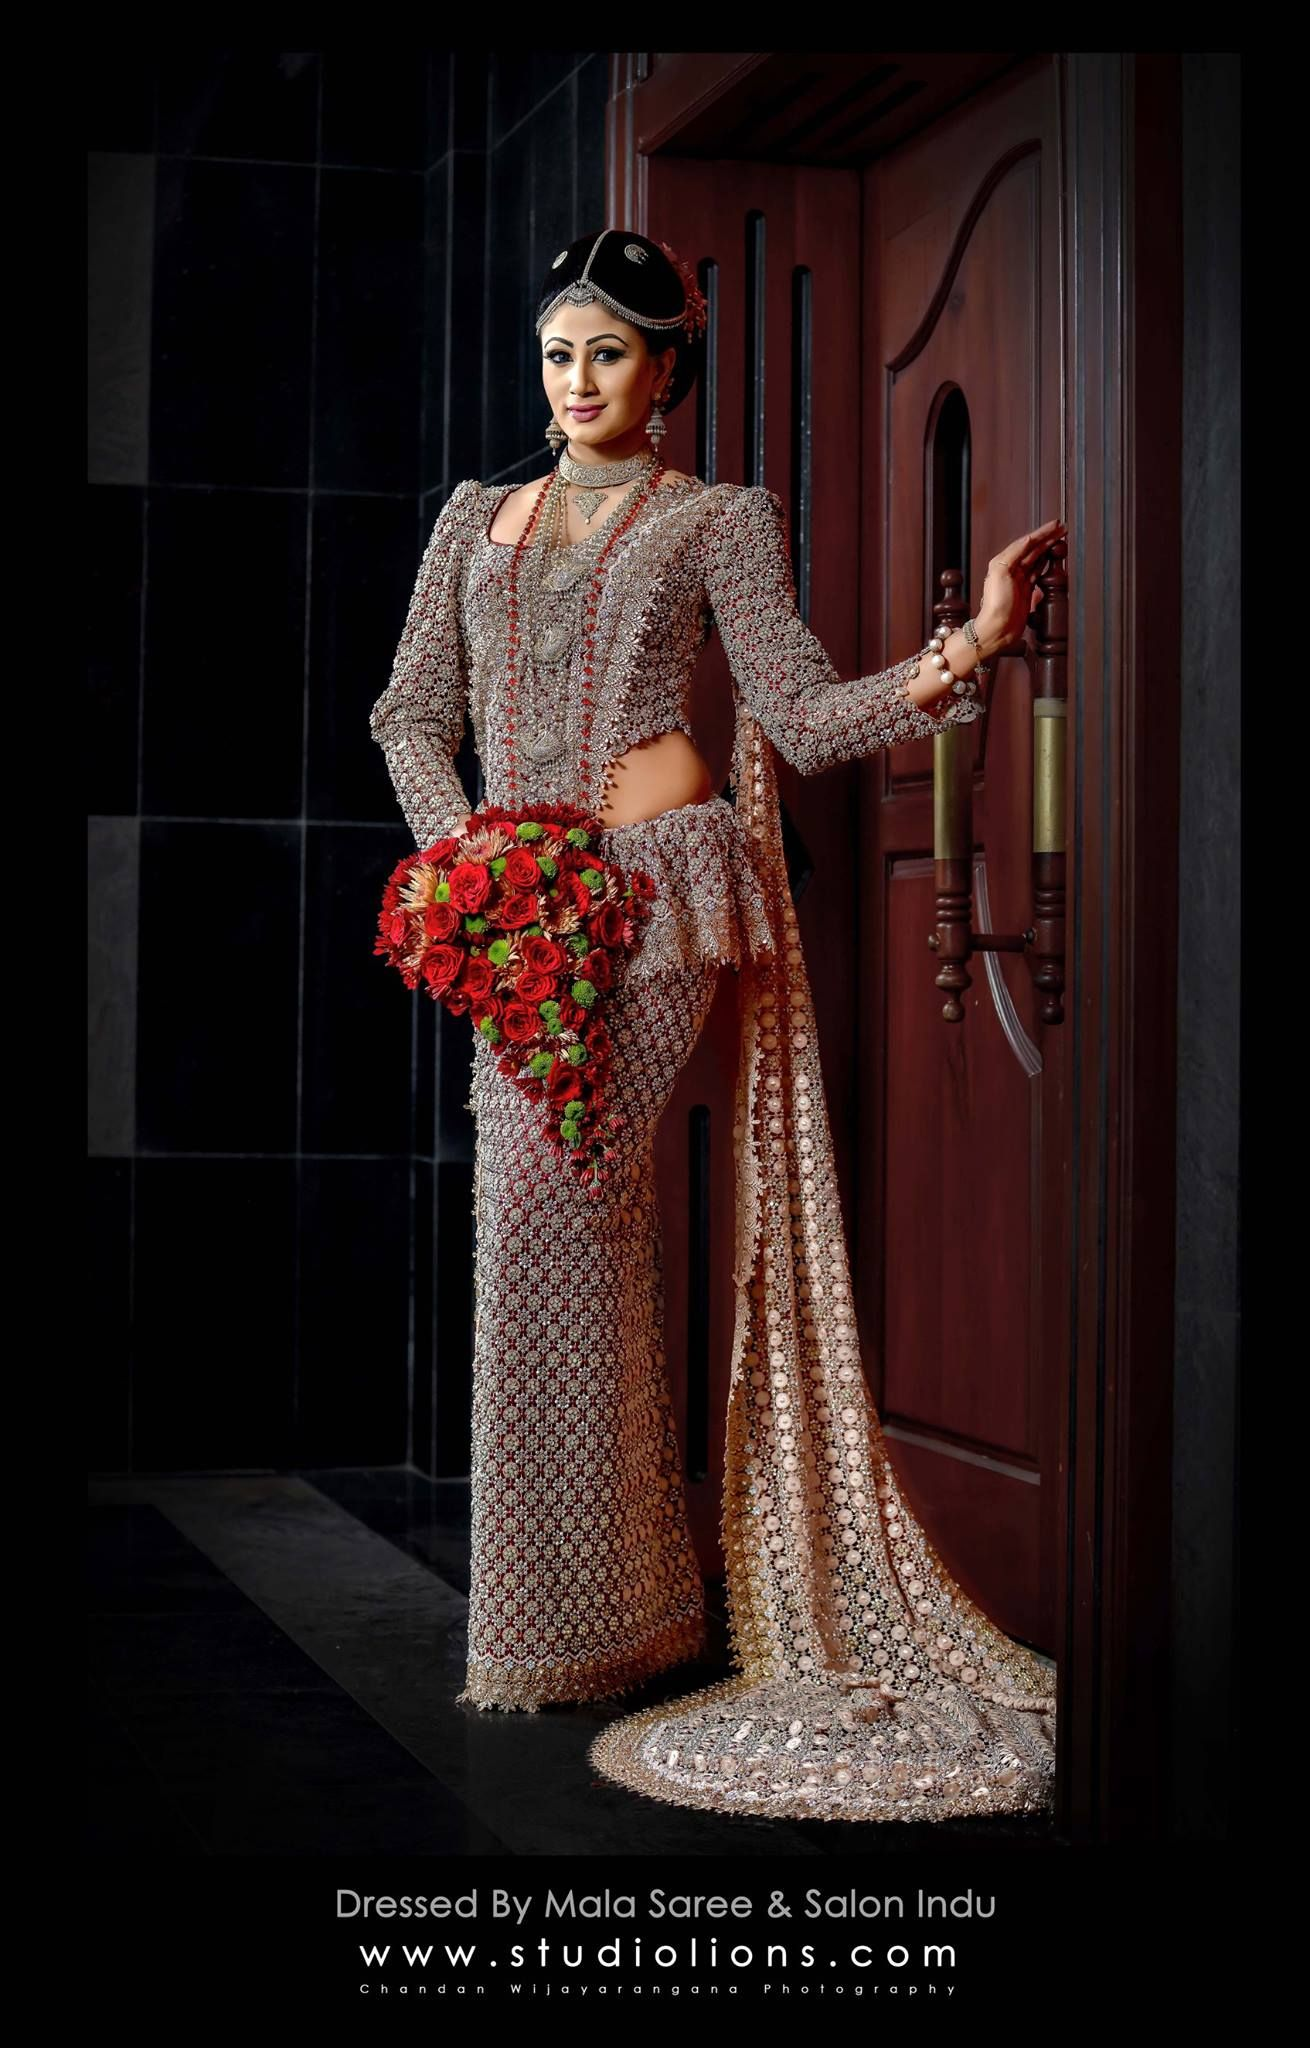 Sri Lankan Fashion Indian Wedding Dress Modern Bridal Dress Design Bridal Sari